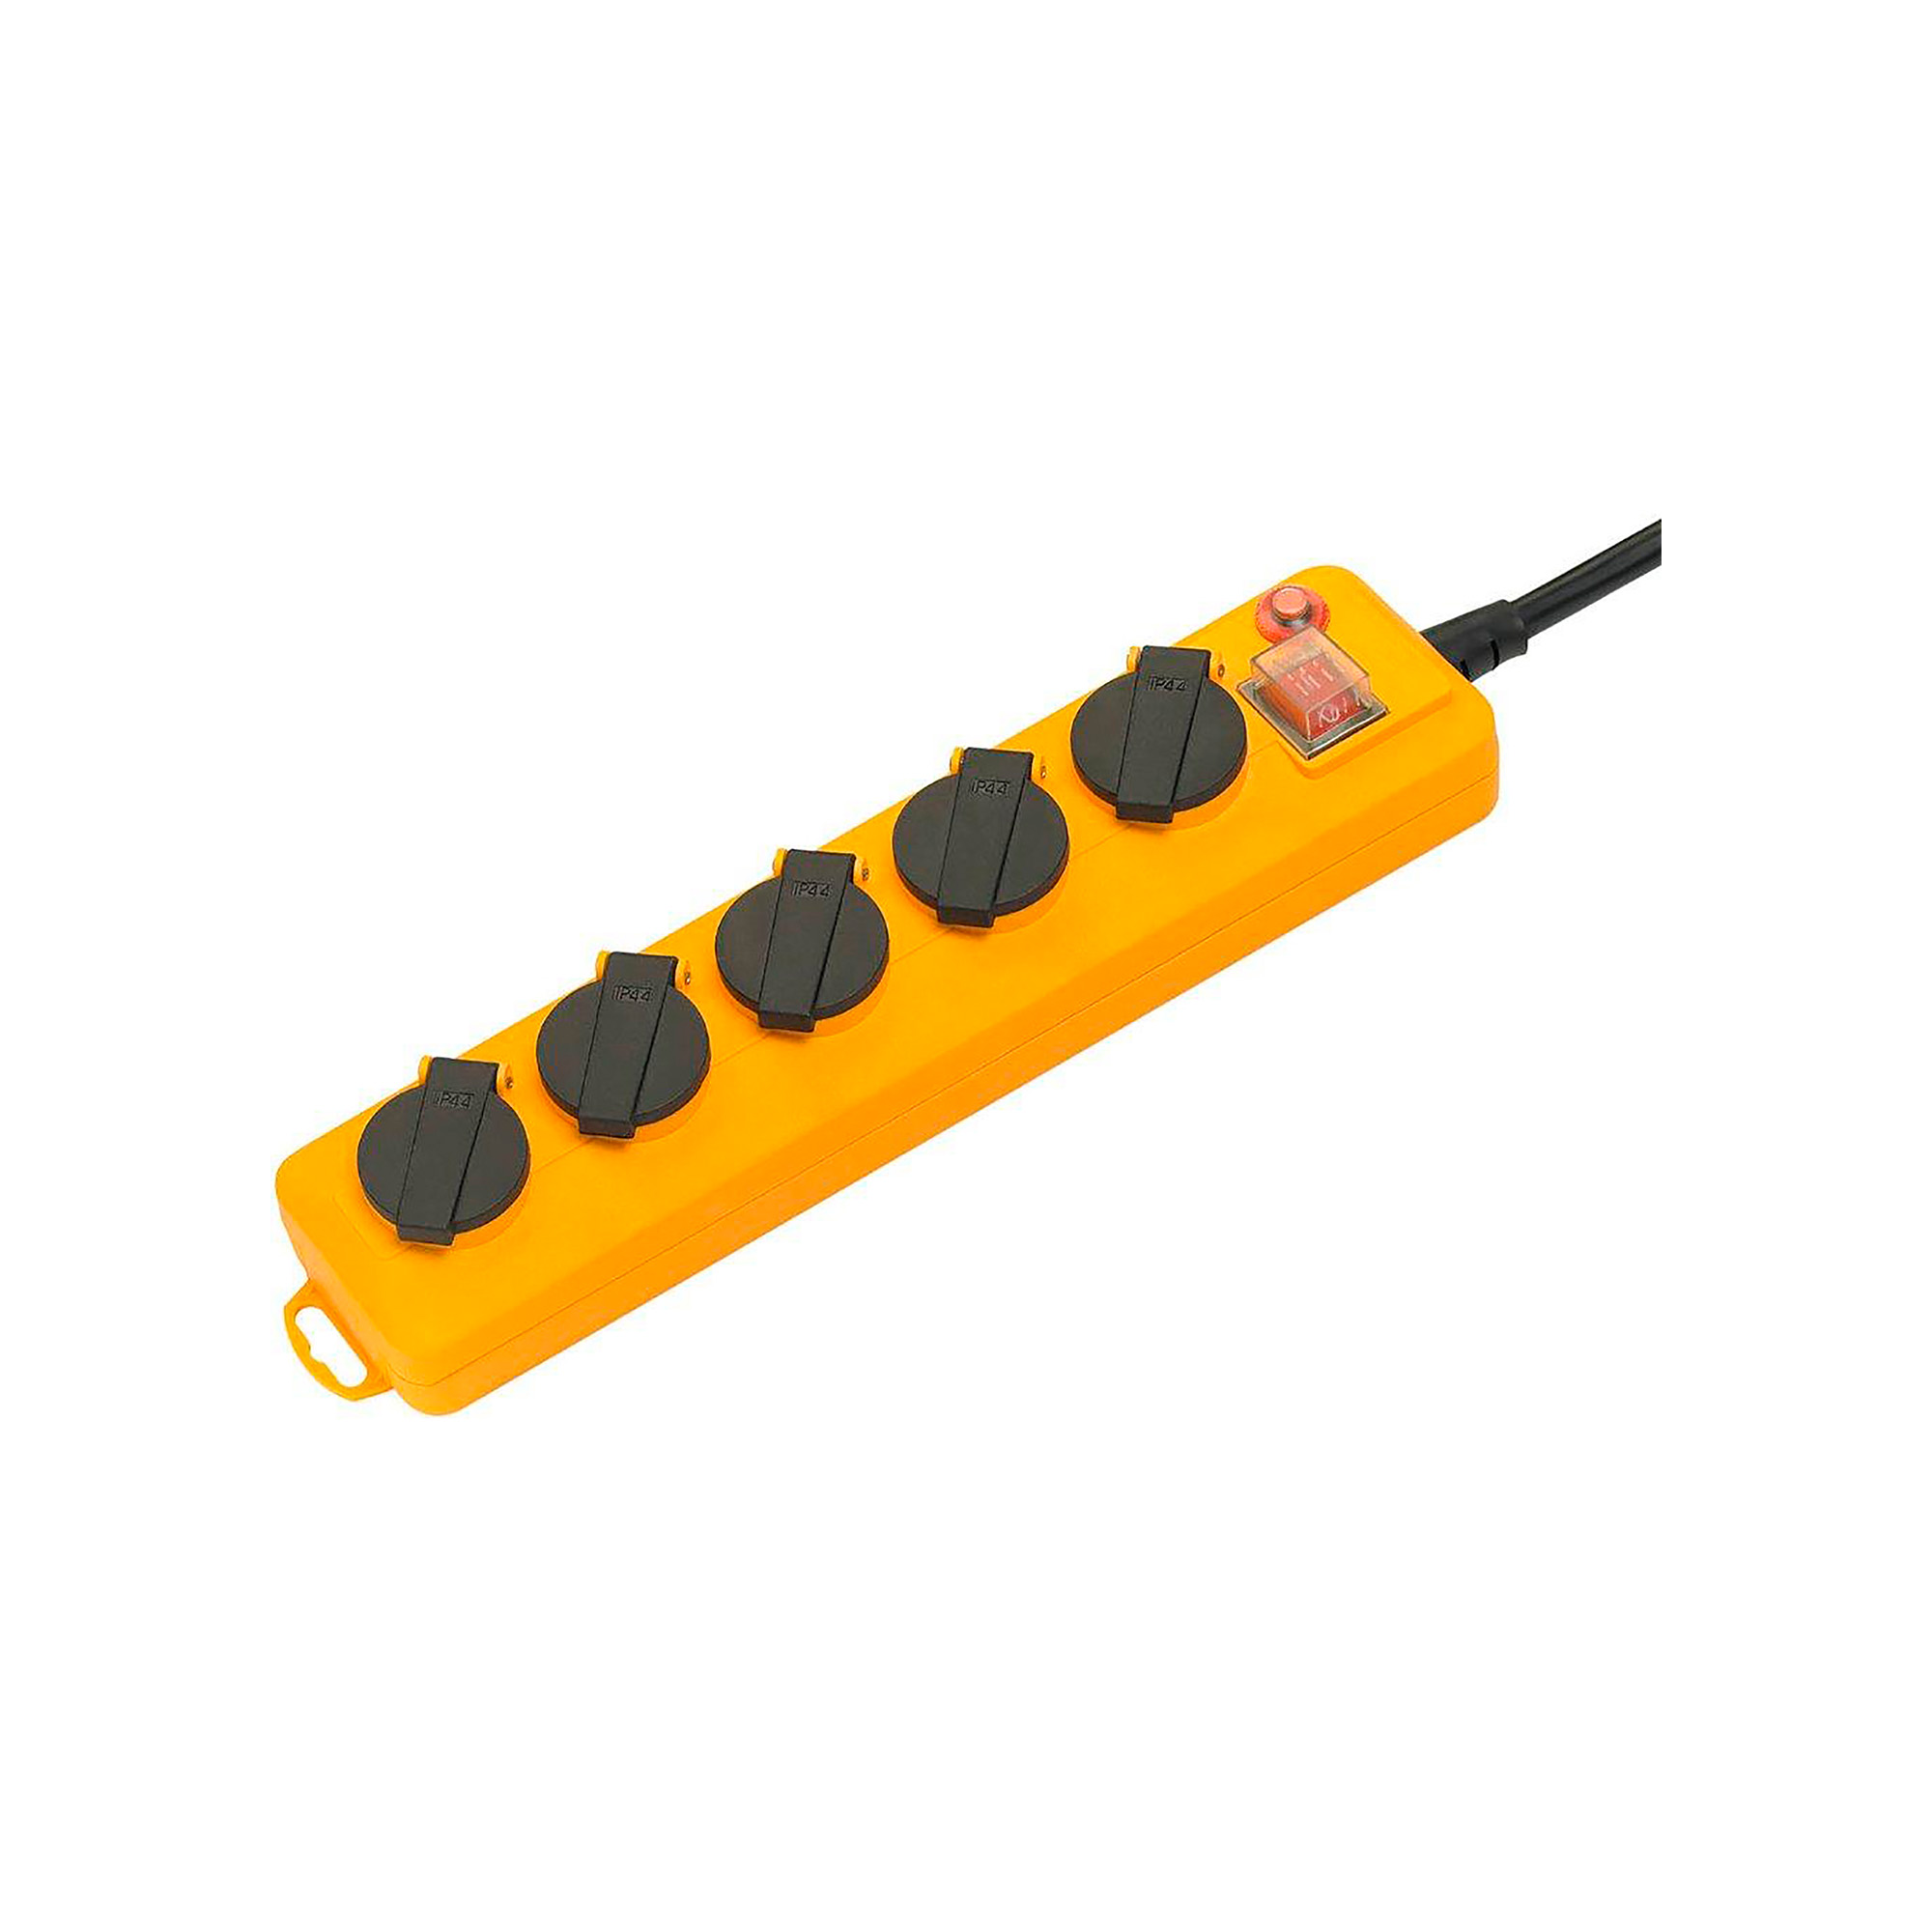 Manfrotto Multi-plug 16A available to rent / verhuur / location at 50.8 Studio • Belgïe, Belgique, Belgium, Grip, Huur, Location, Louer, Manfrotto, Photo, Rent, Rental, Stand, Studio, Verhuur, Video